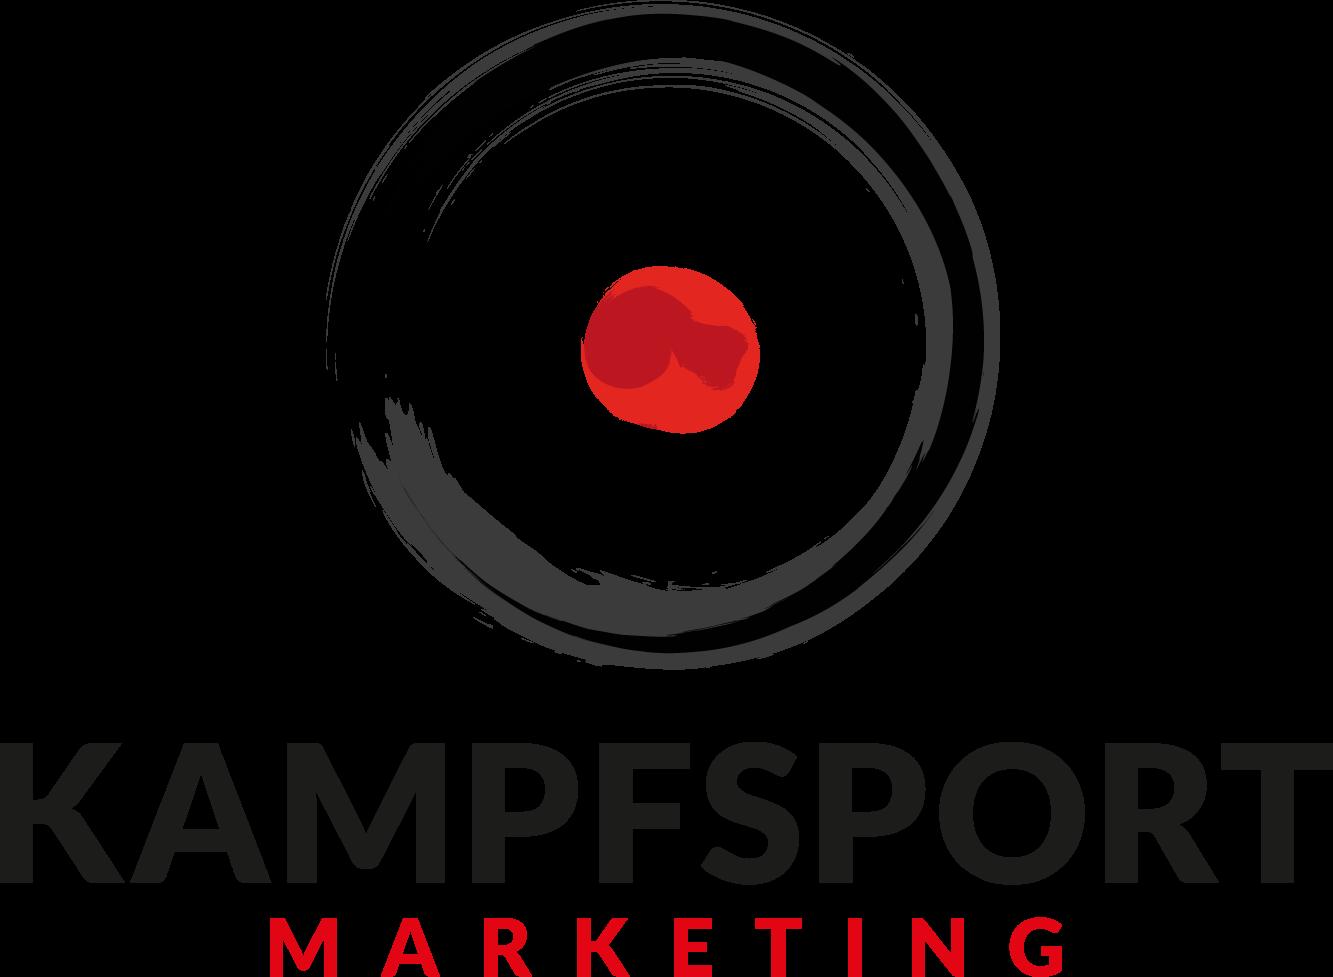 Kampfsport Marketing